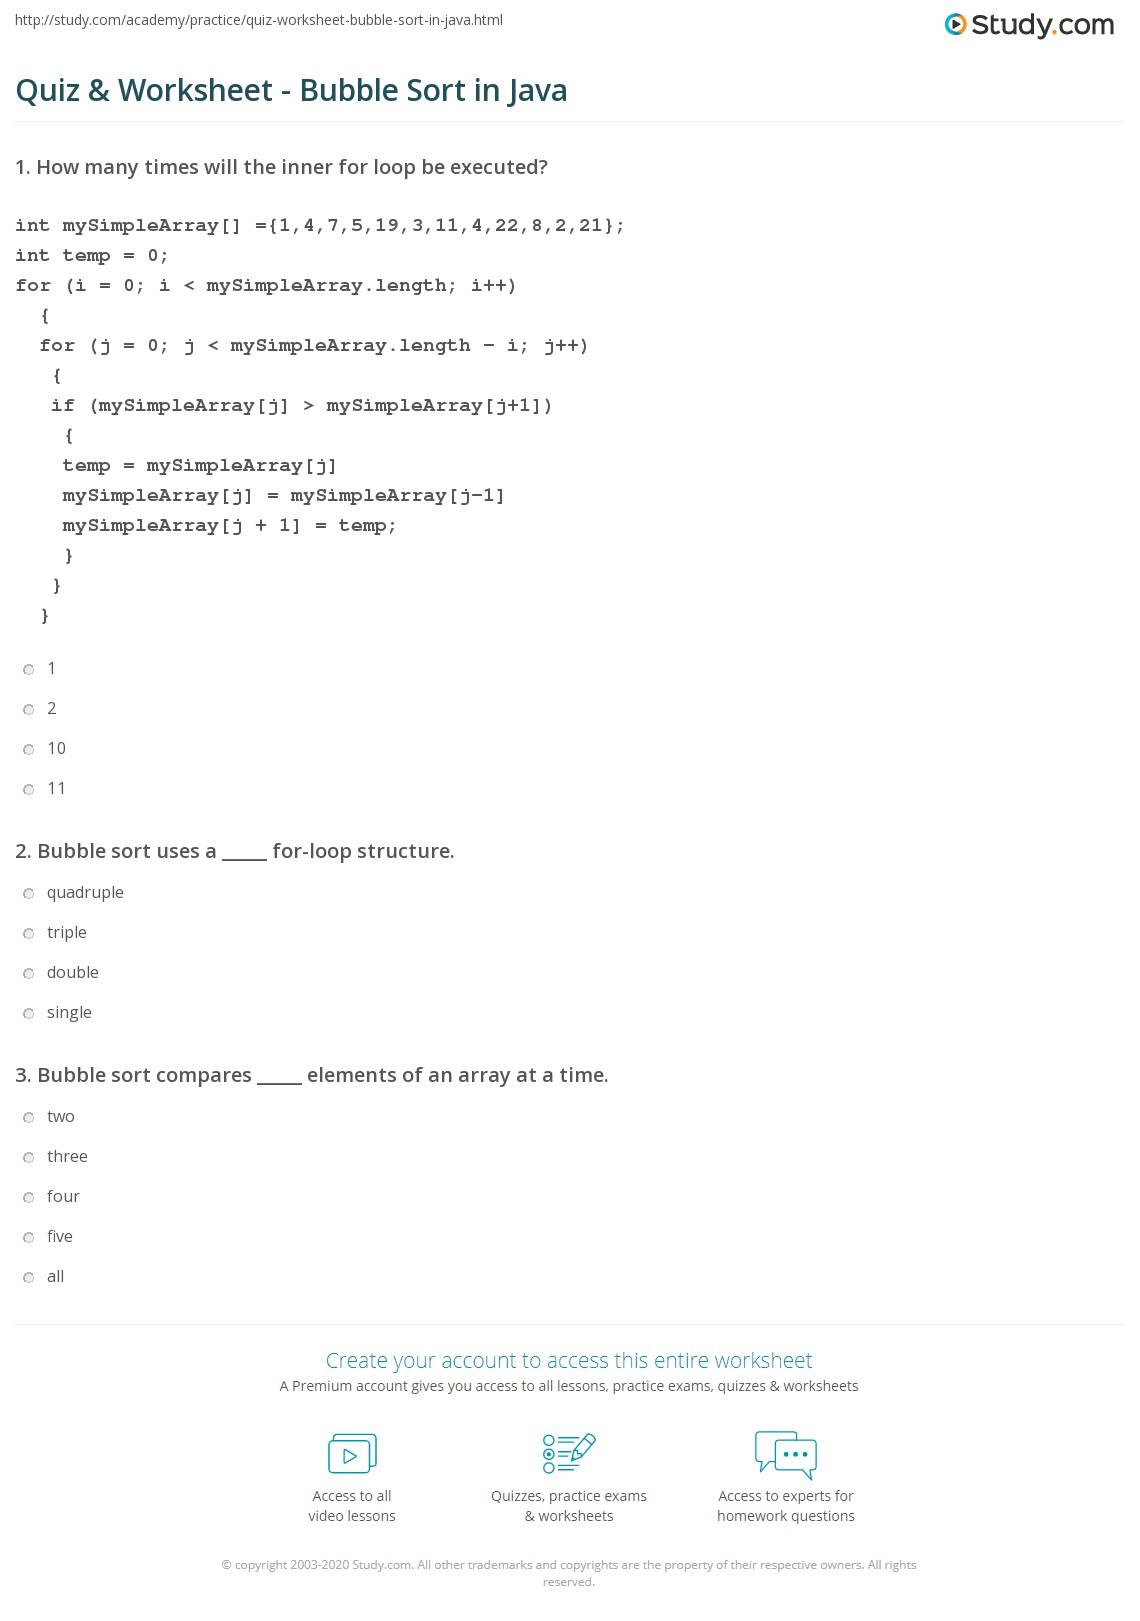 Quiz & Worksheet - Bubble Sort in Java | Study.com